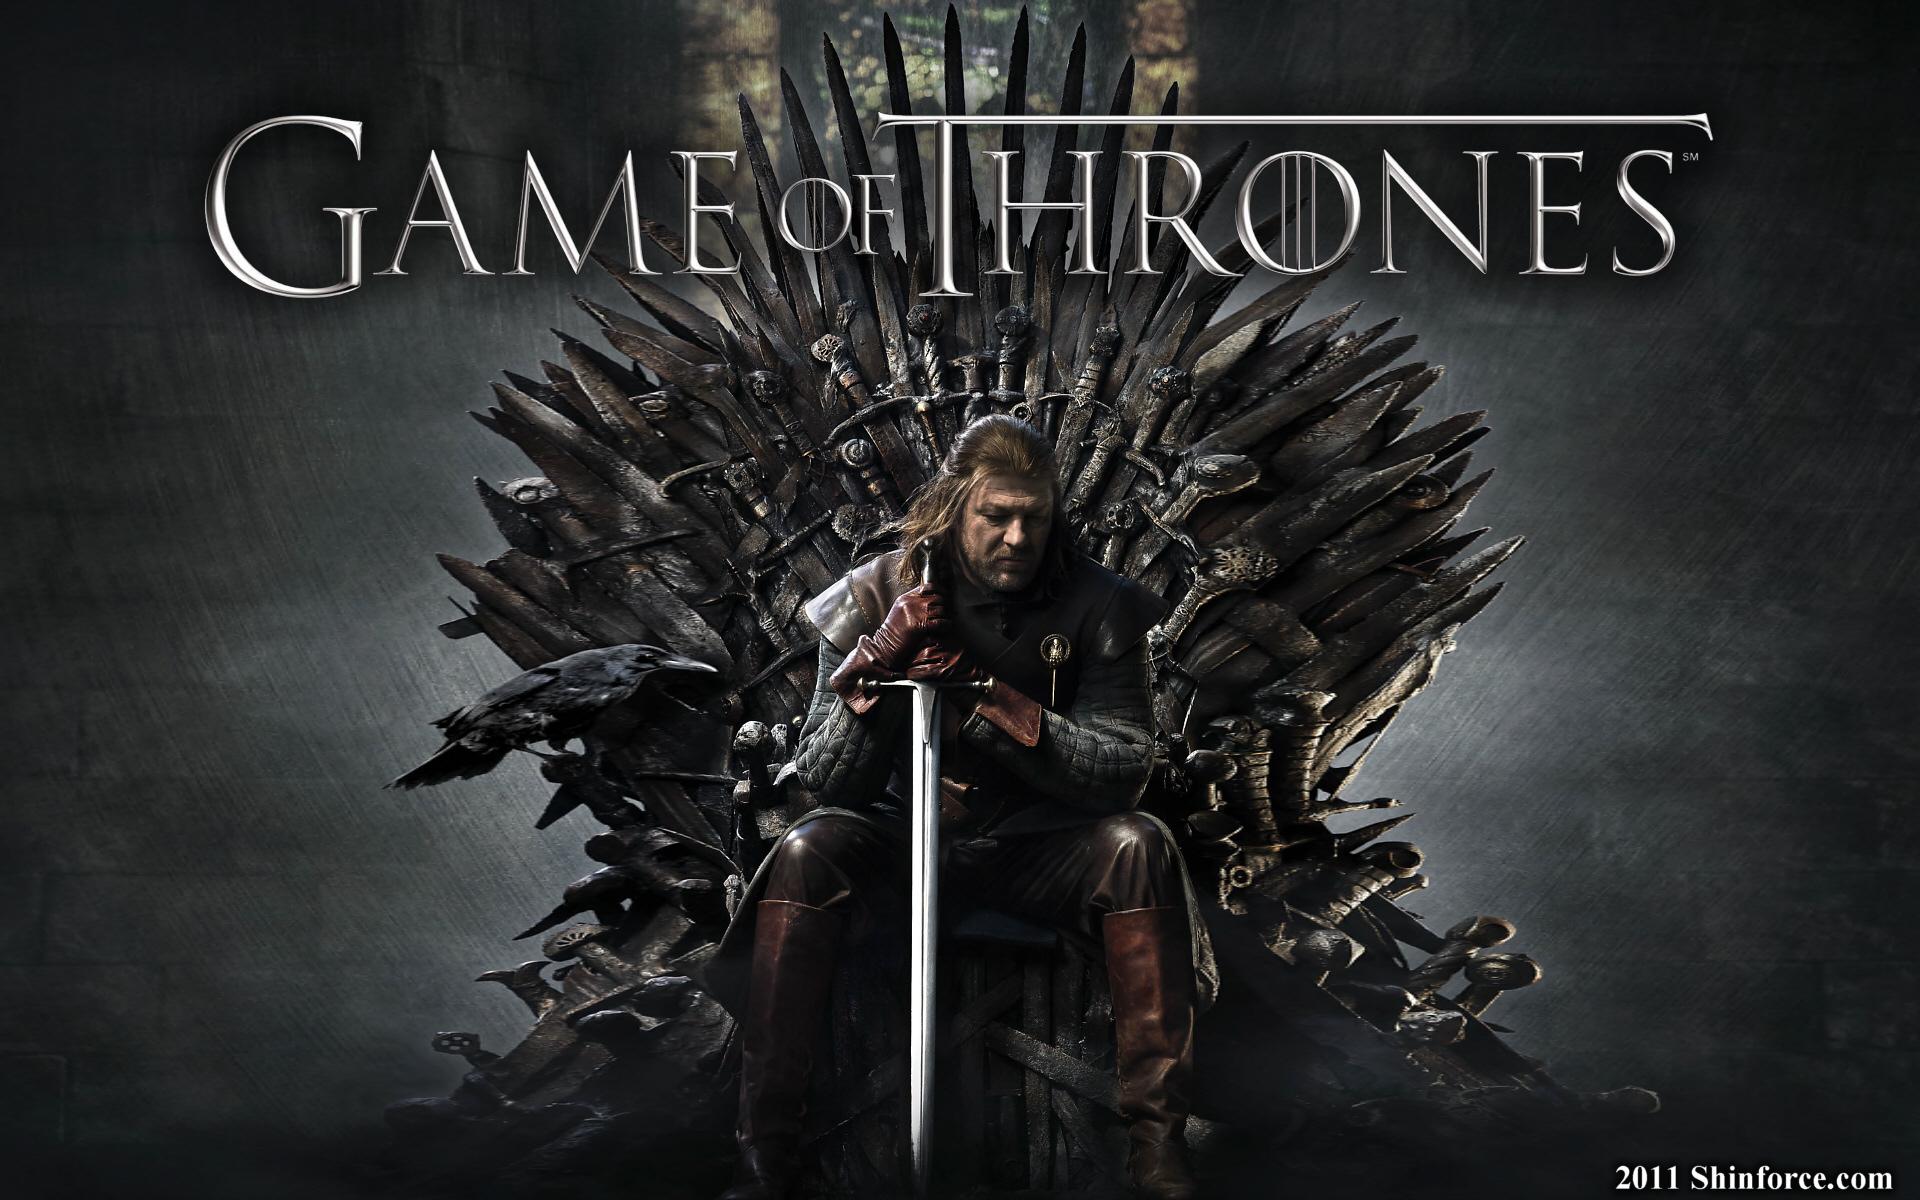 game_of_thrones-01-1920x1200.jpg